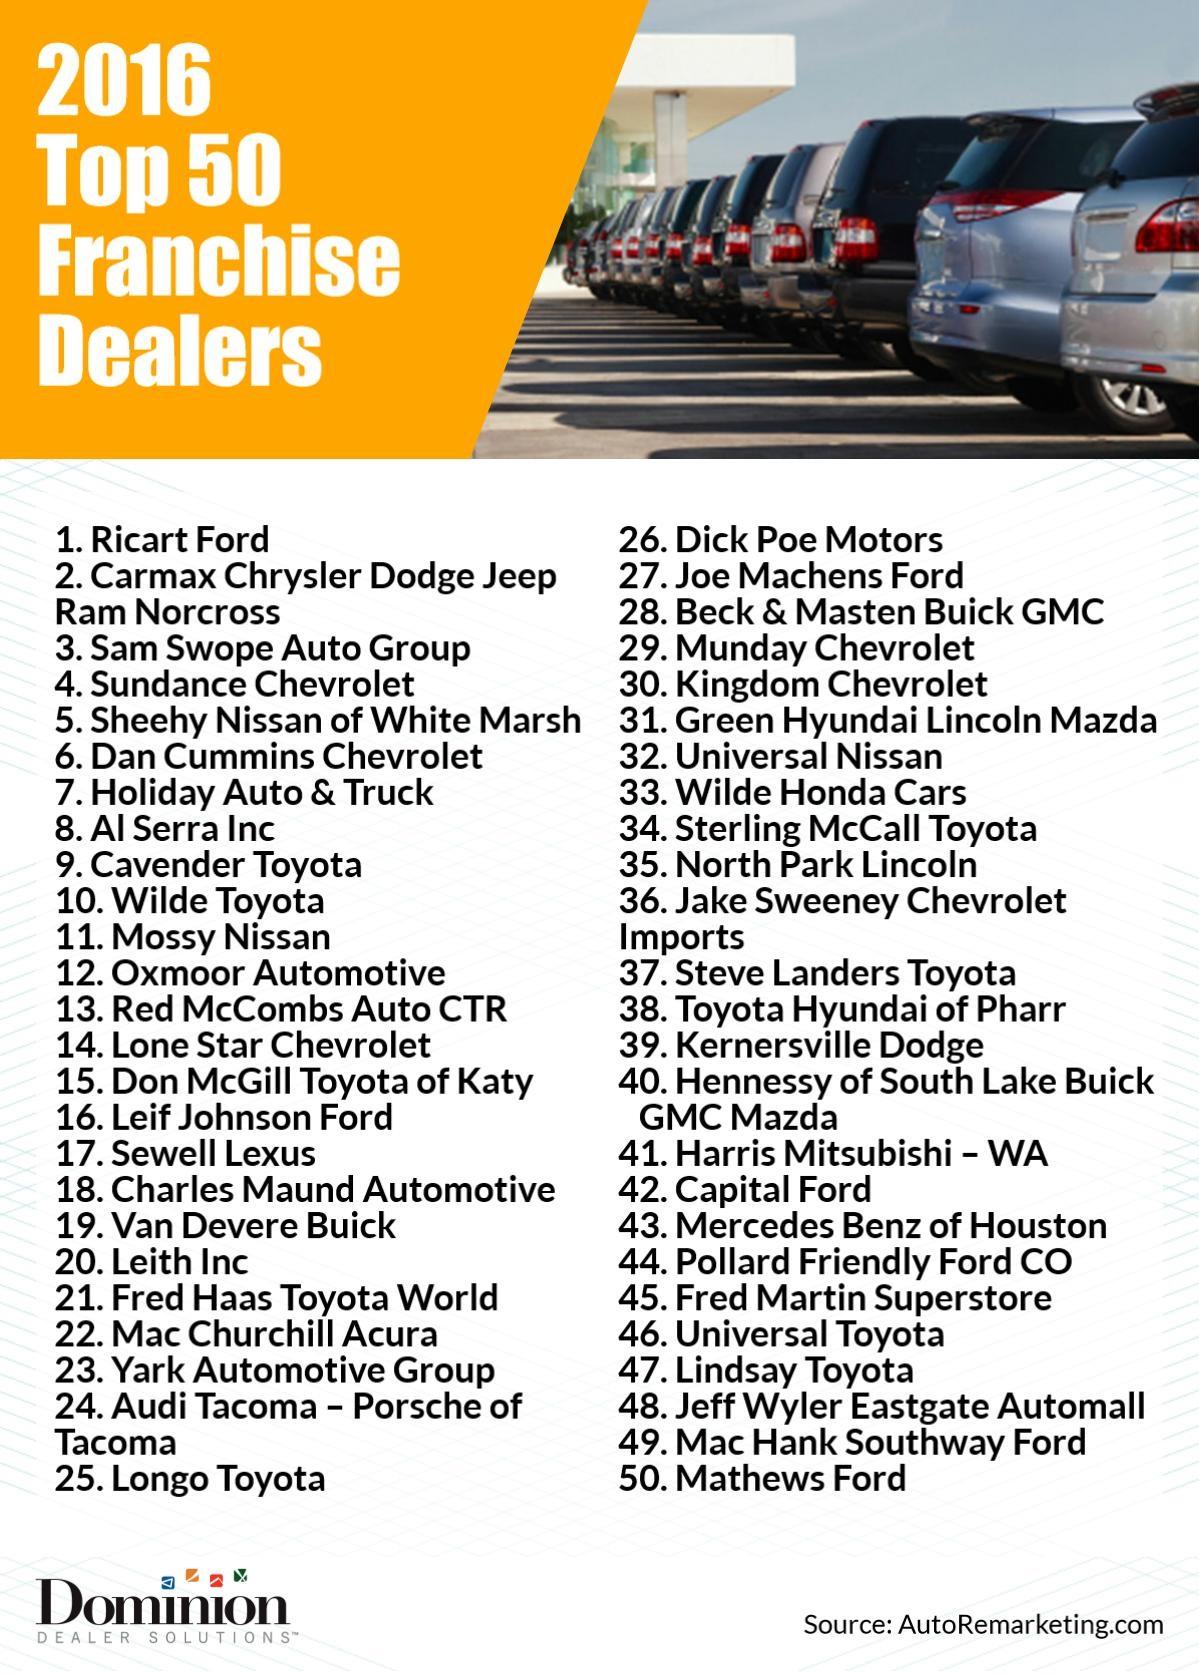 Top 50 Franchise Dealers Dominion Dealer Solutions